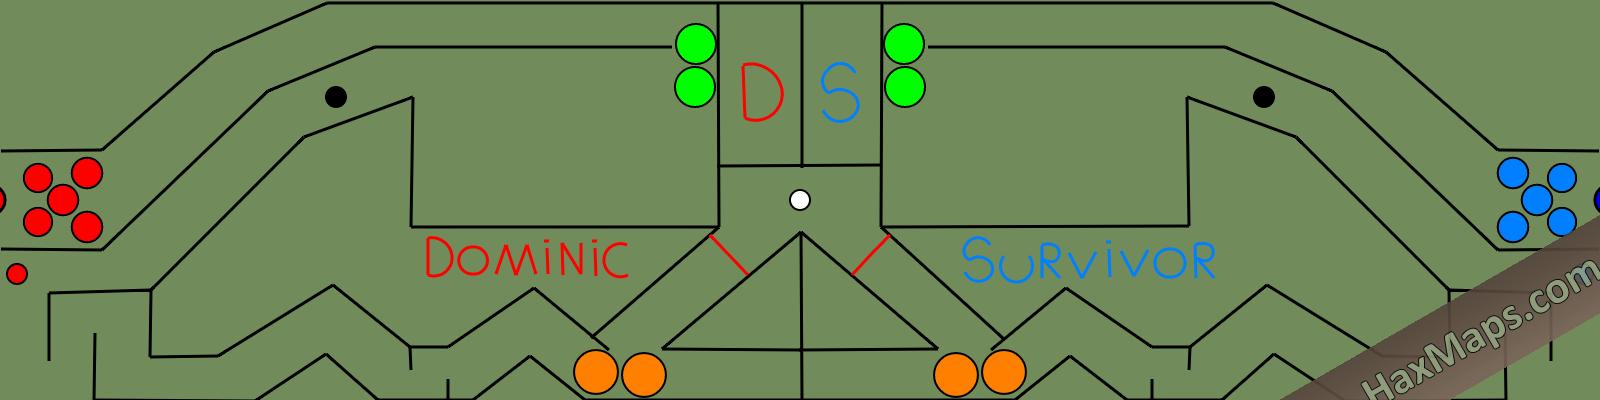 hax ball maps | DOMINIC SURVIVOR 13